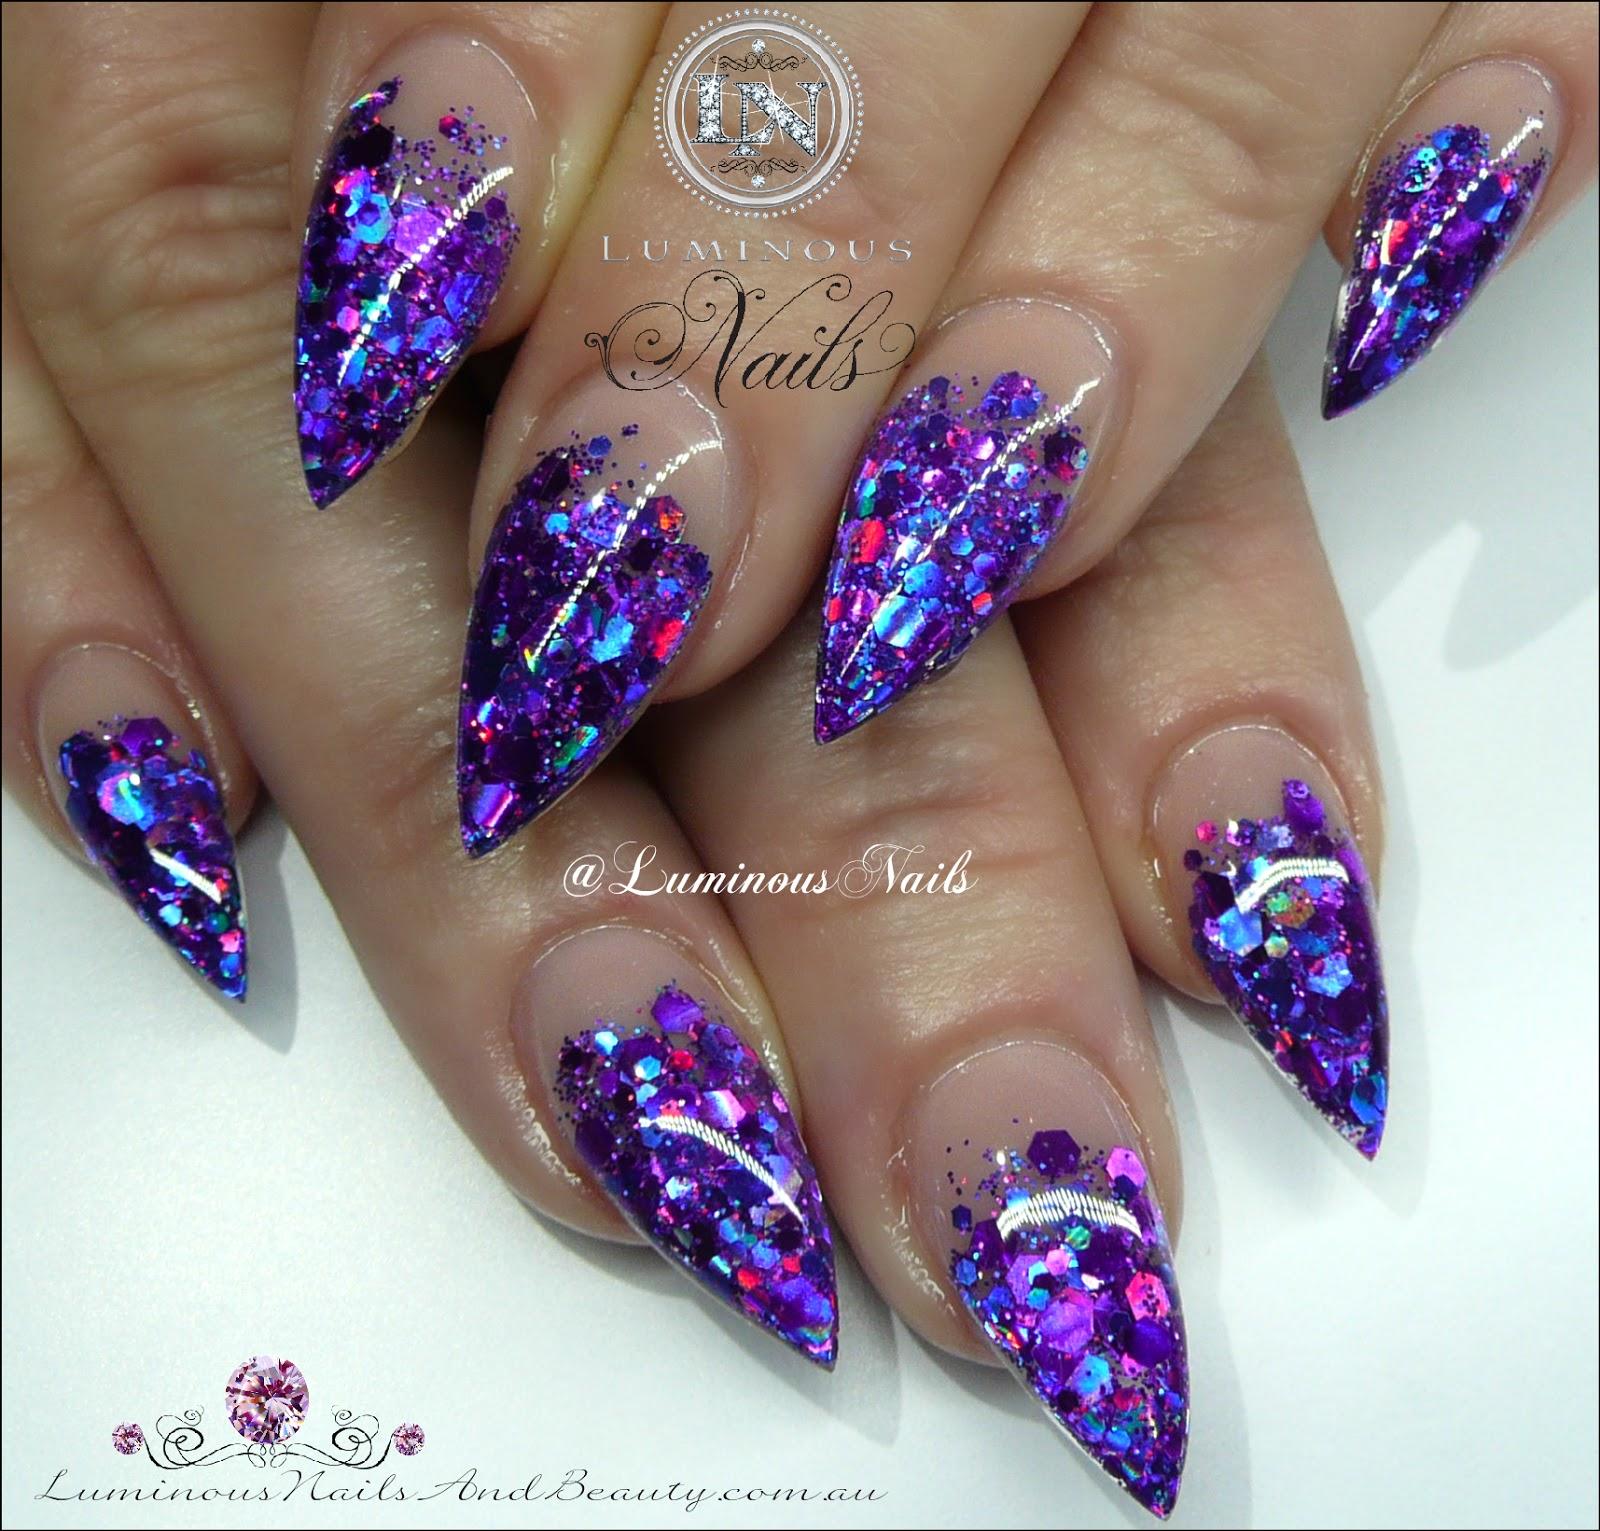 Luminous Nails: Stunning Glittery Indigo Acrylic Nails...